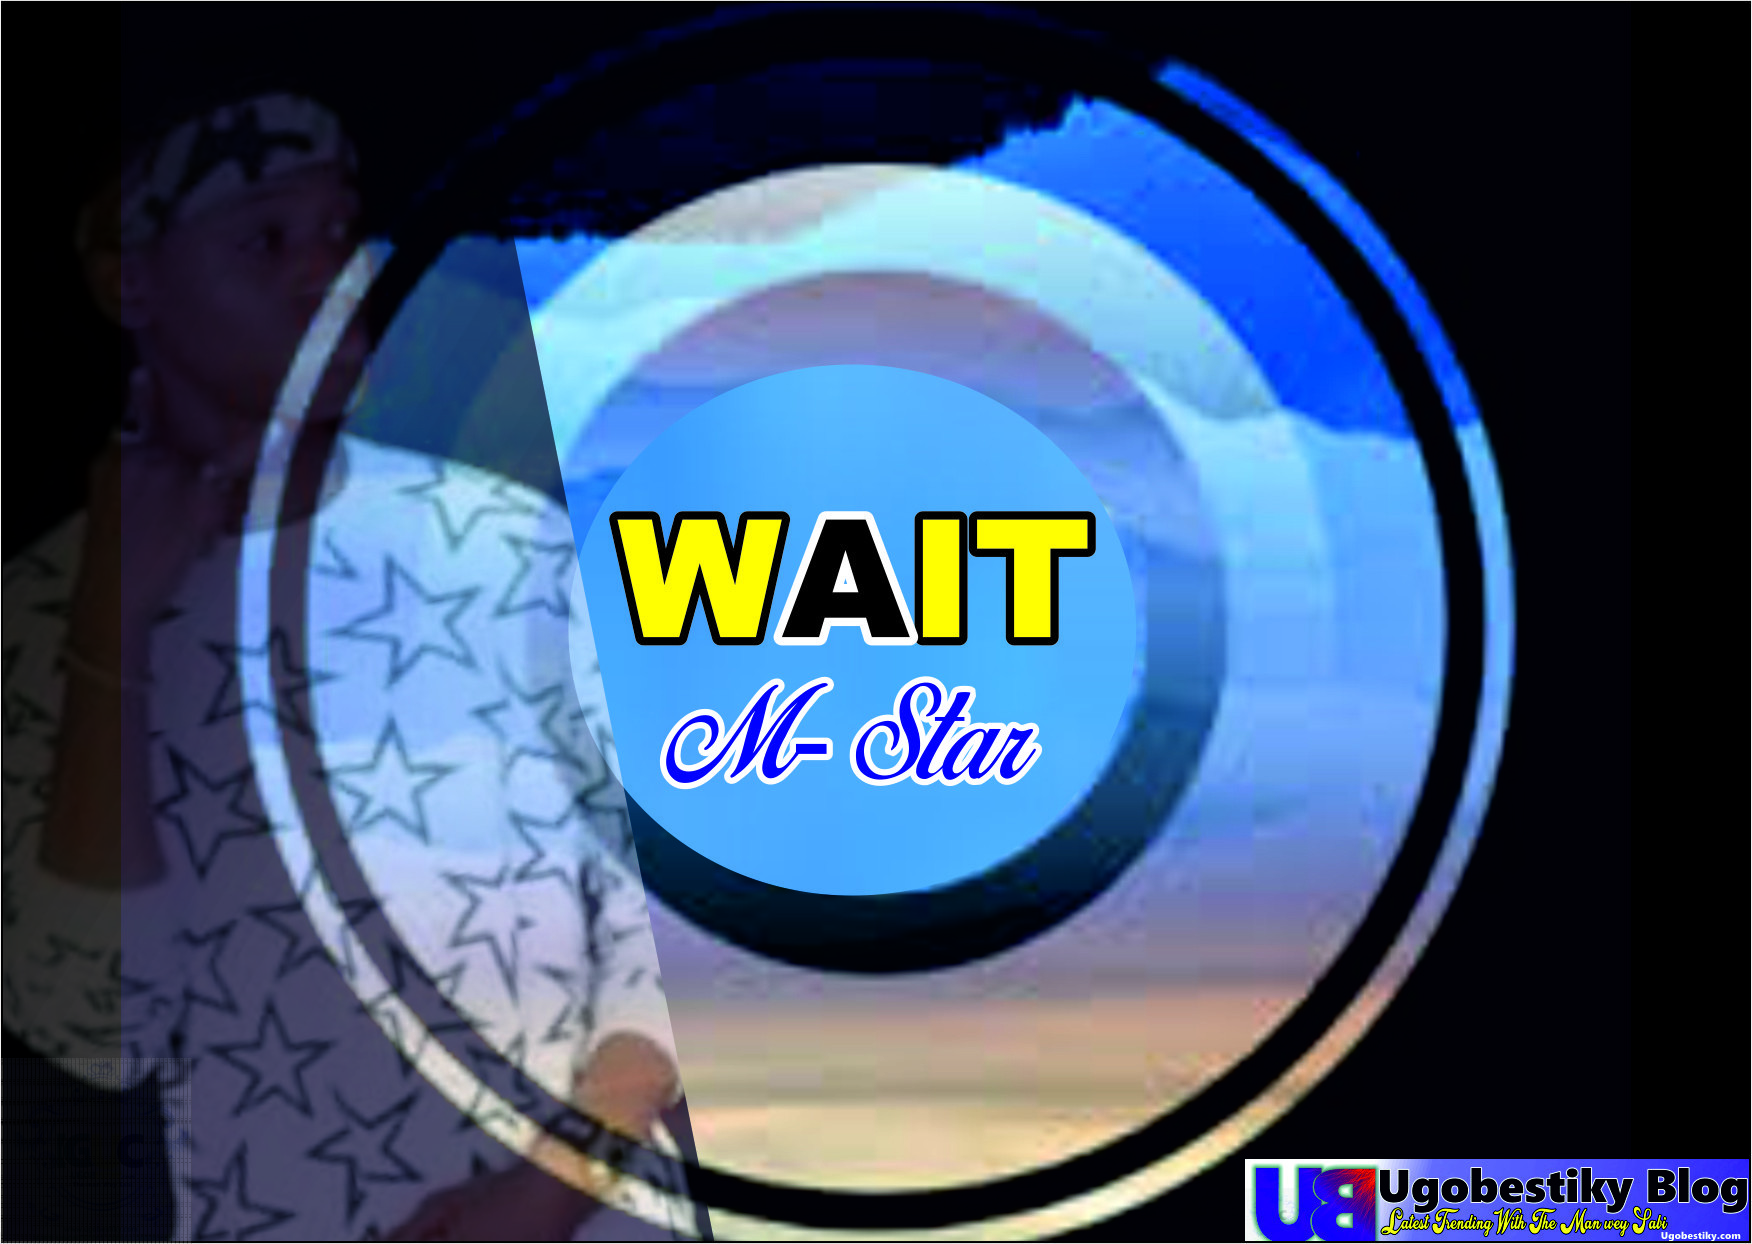 Wait - Mstar mp3 Download